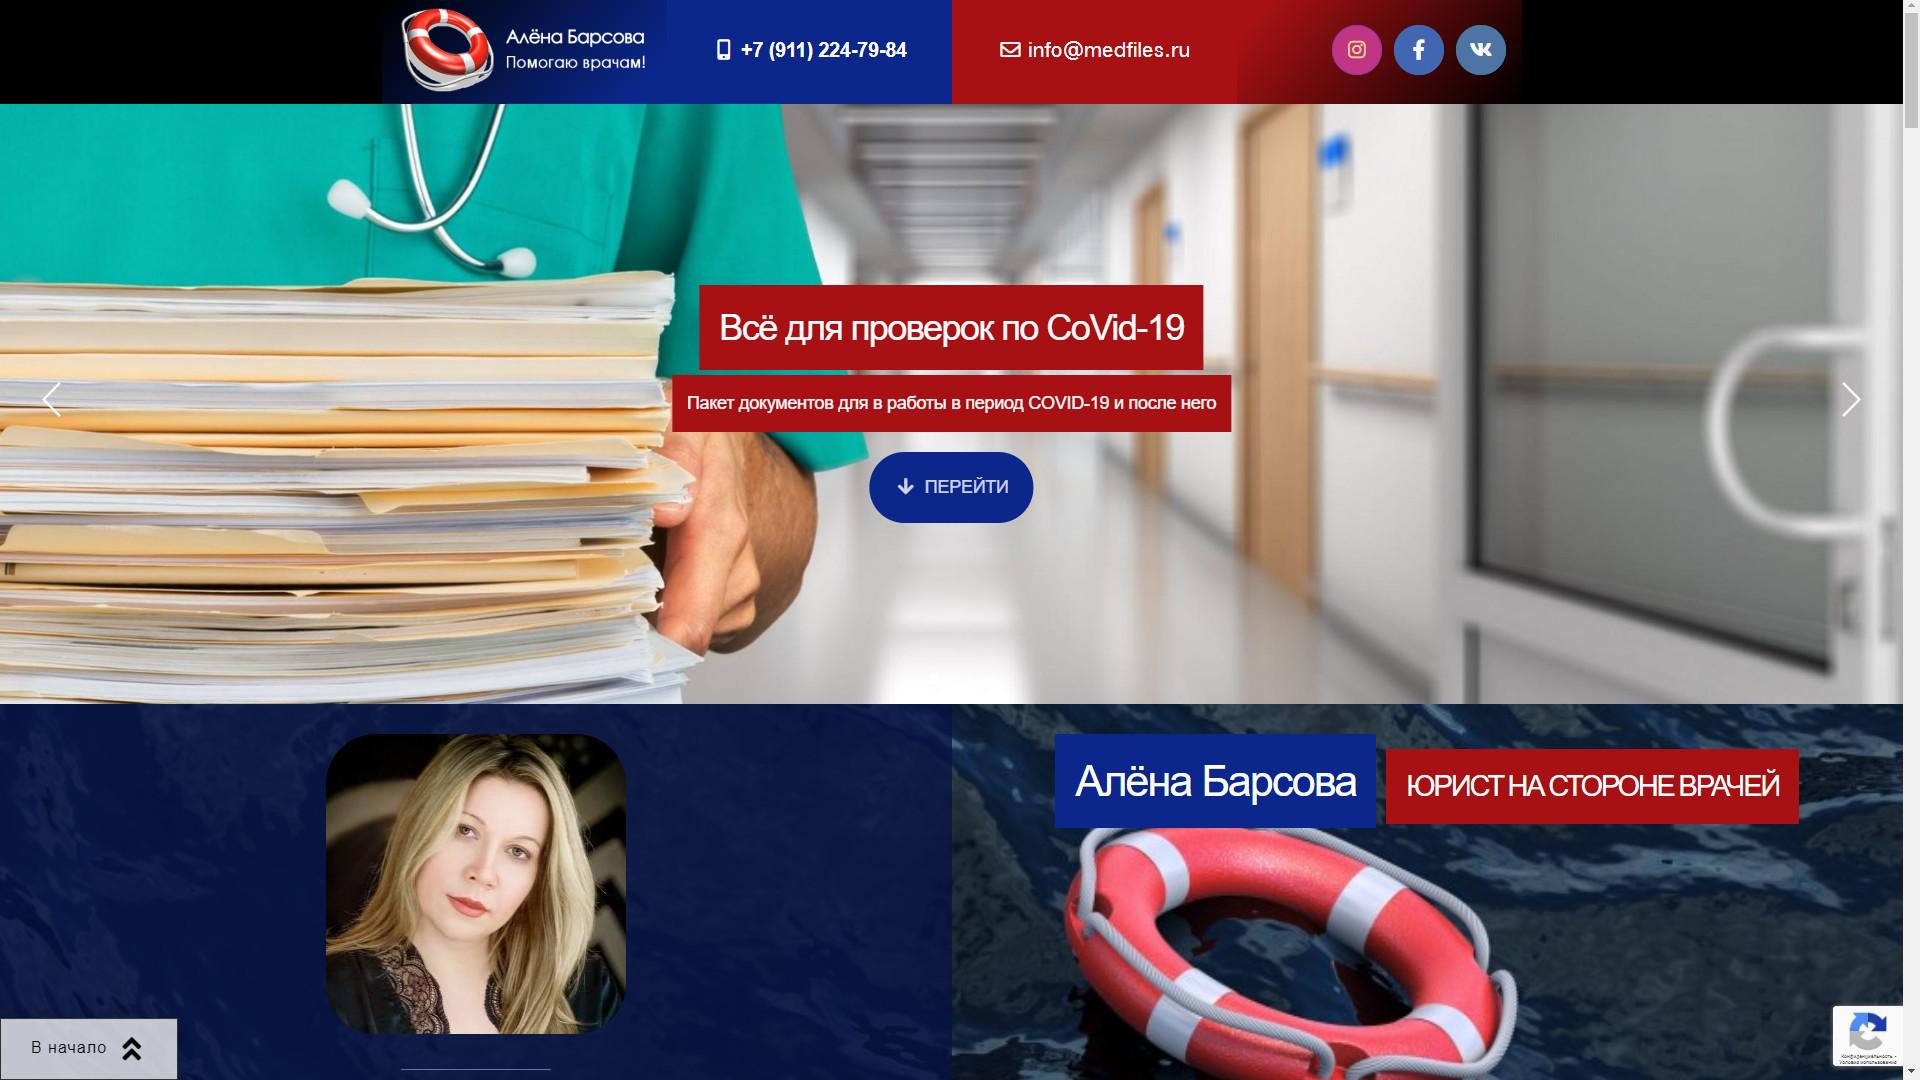 medfiles.ru